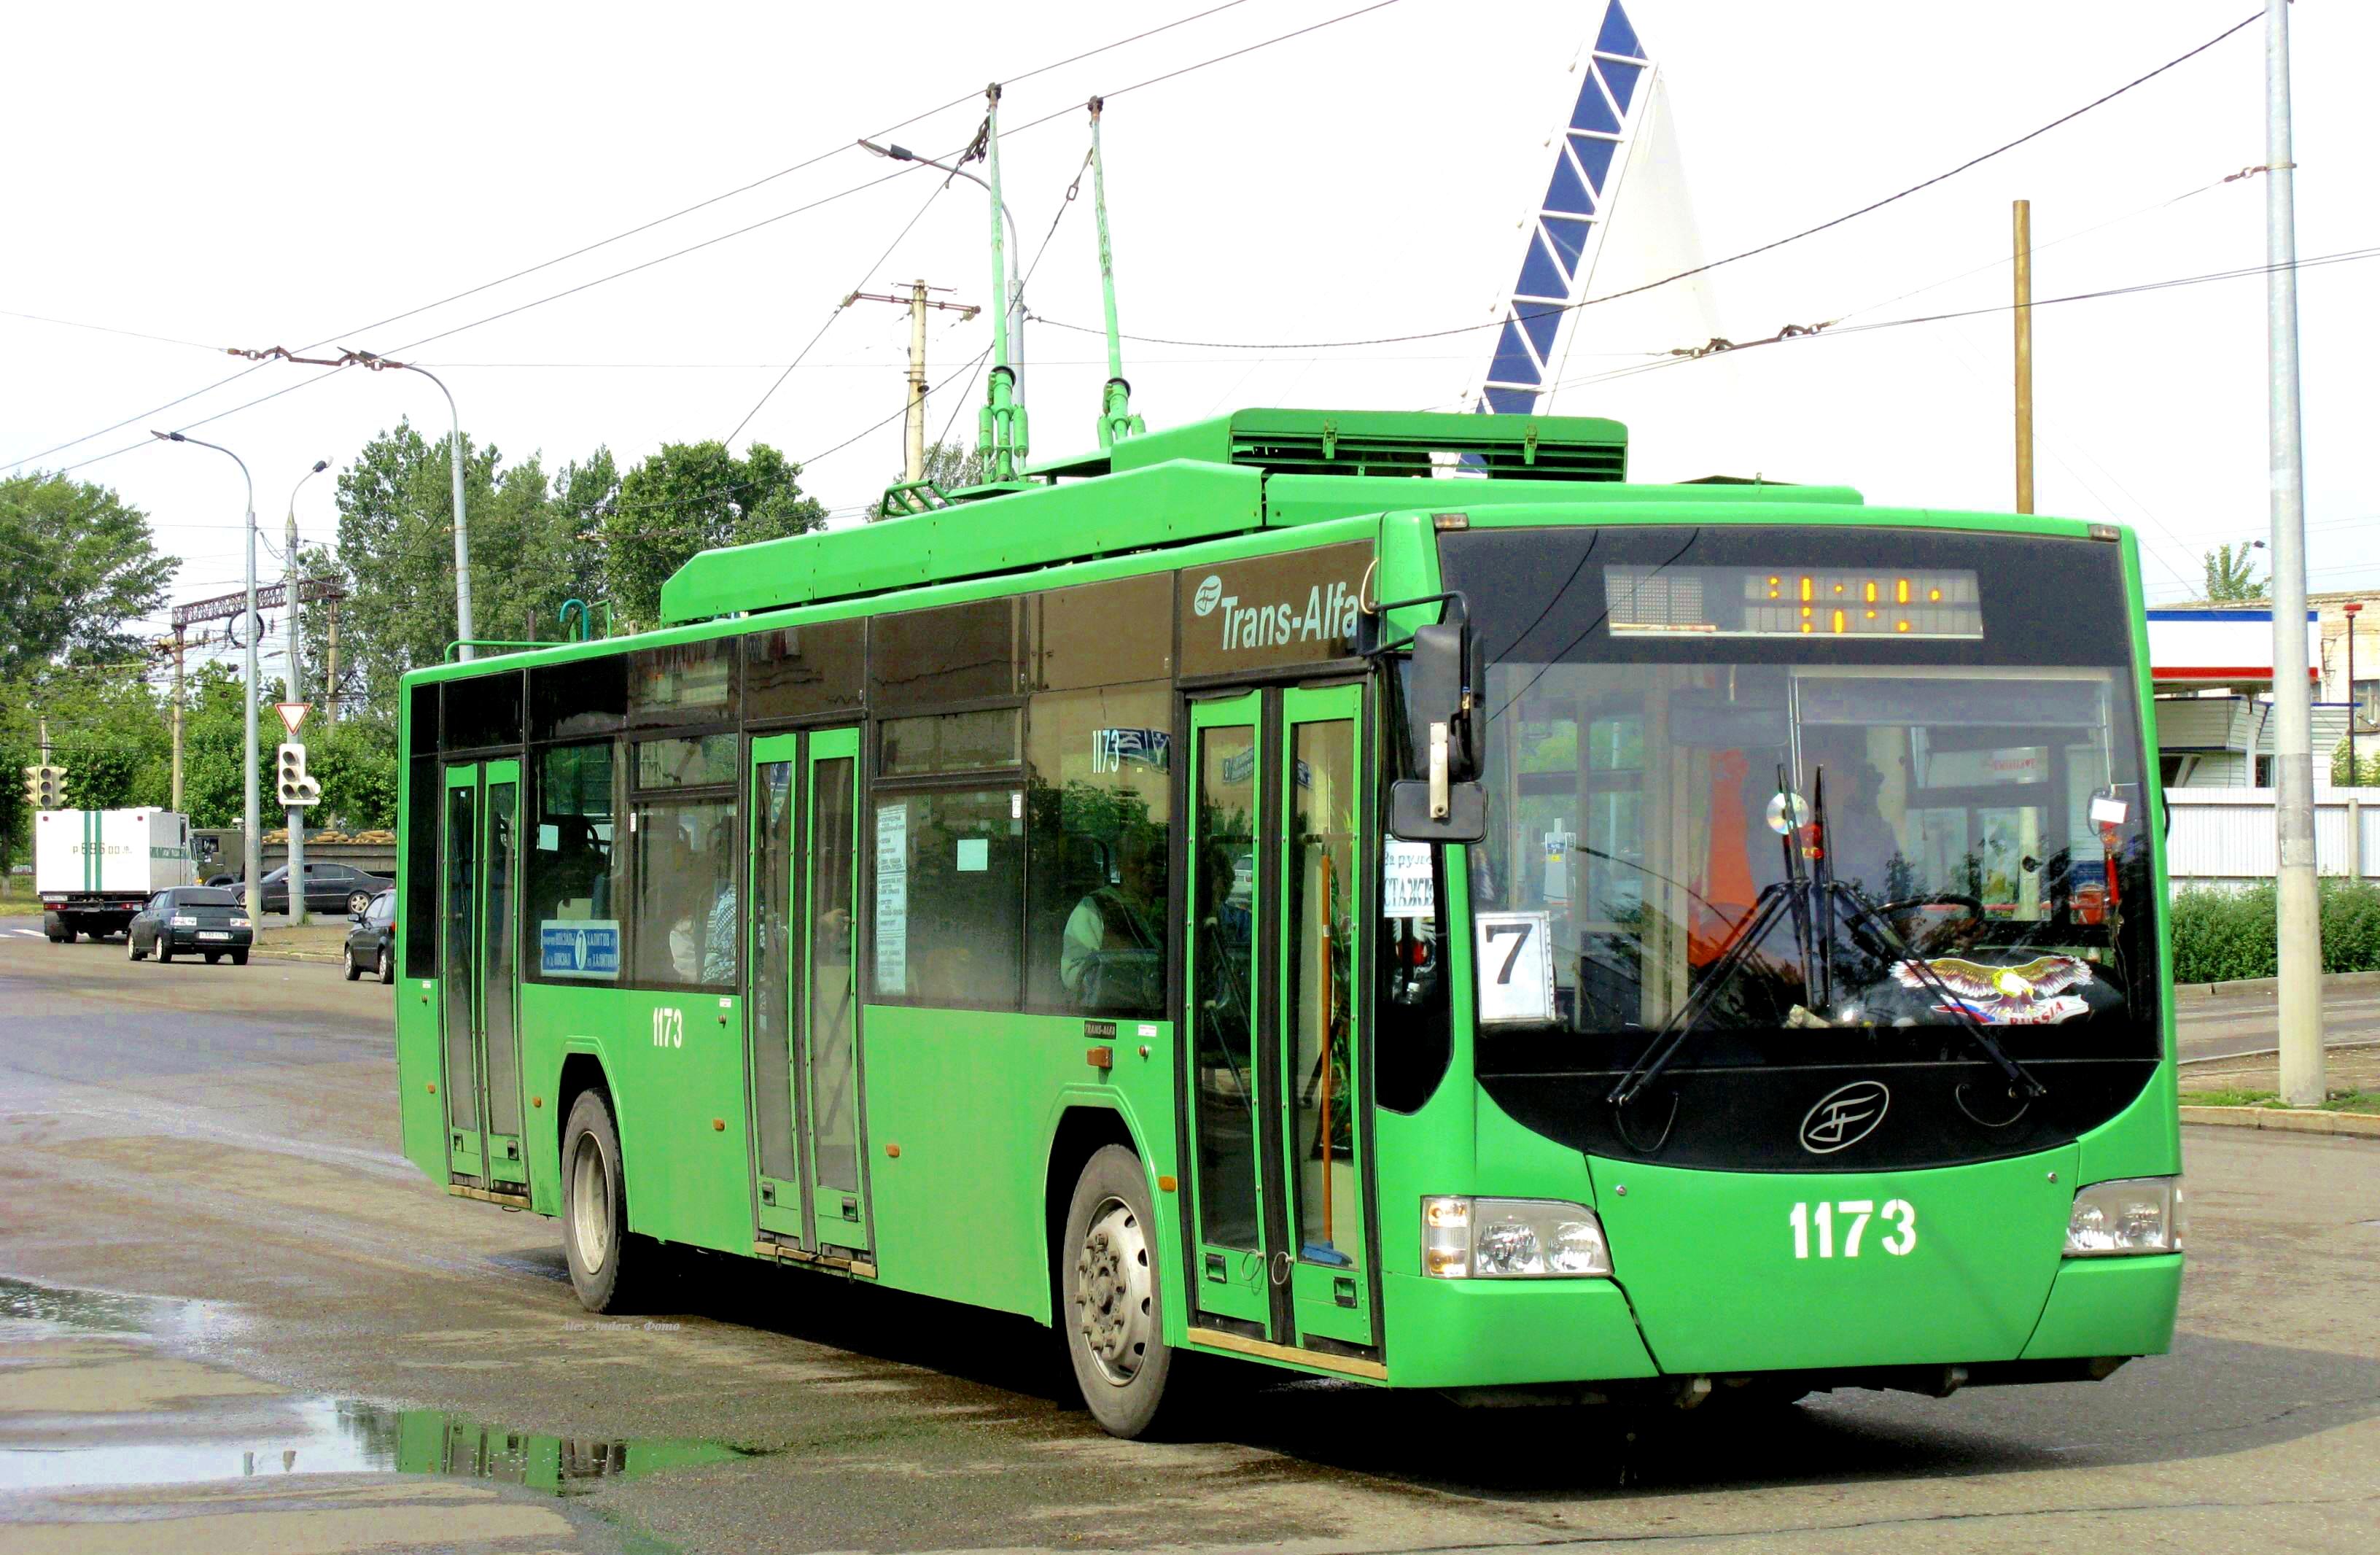 File:Каазанский троллейбус № 1173.jpg